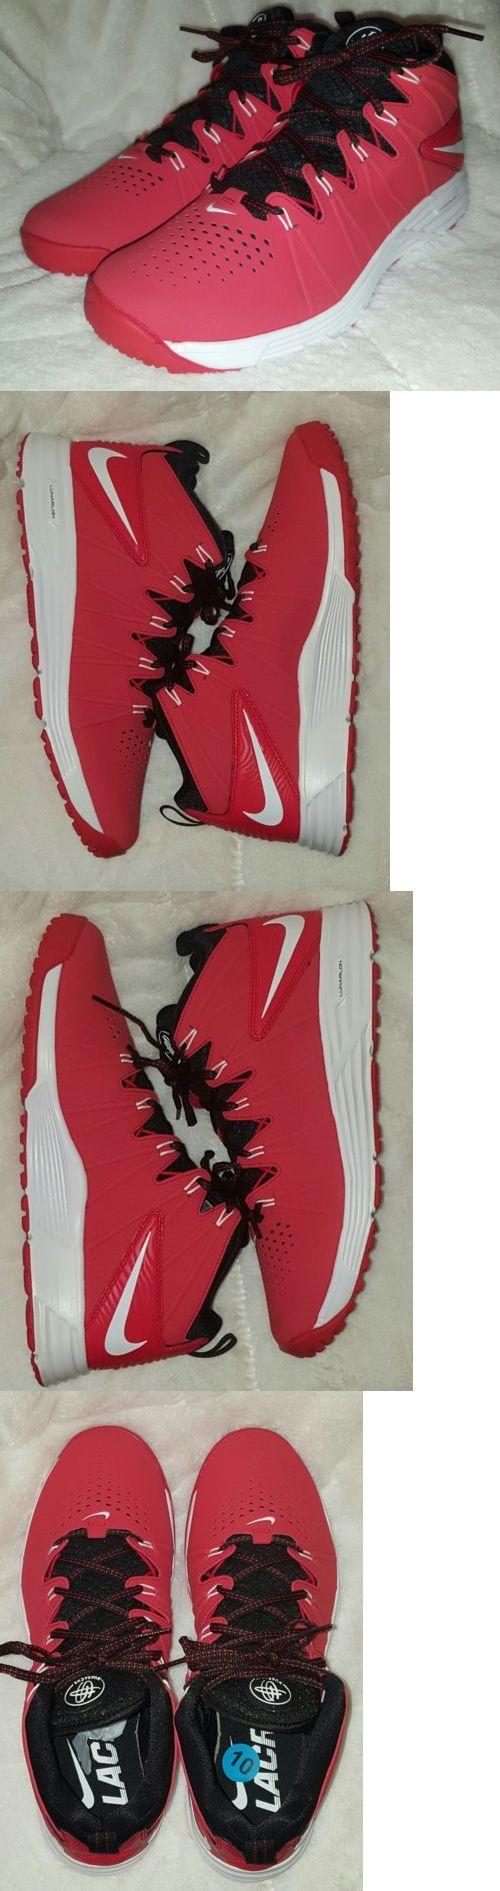 Footwear 159154: Nike Huarache Turf Shoes Mens Size 10 Red Black White Lunarlon -> BUY IT NOW ONLY: $58.98 on eBay!